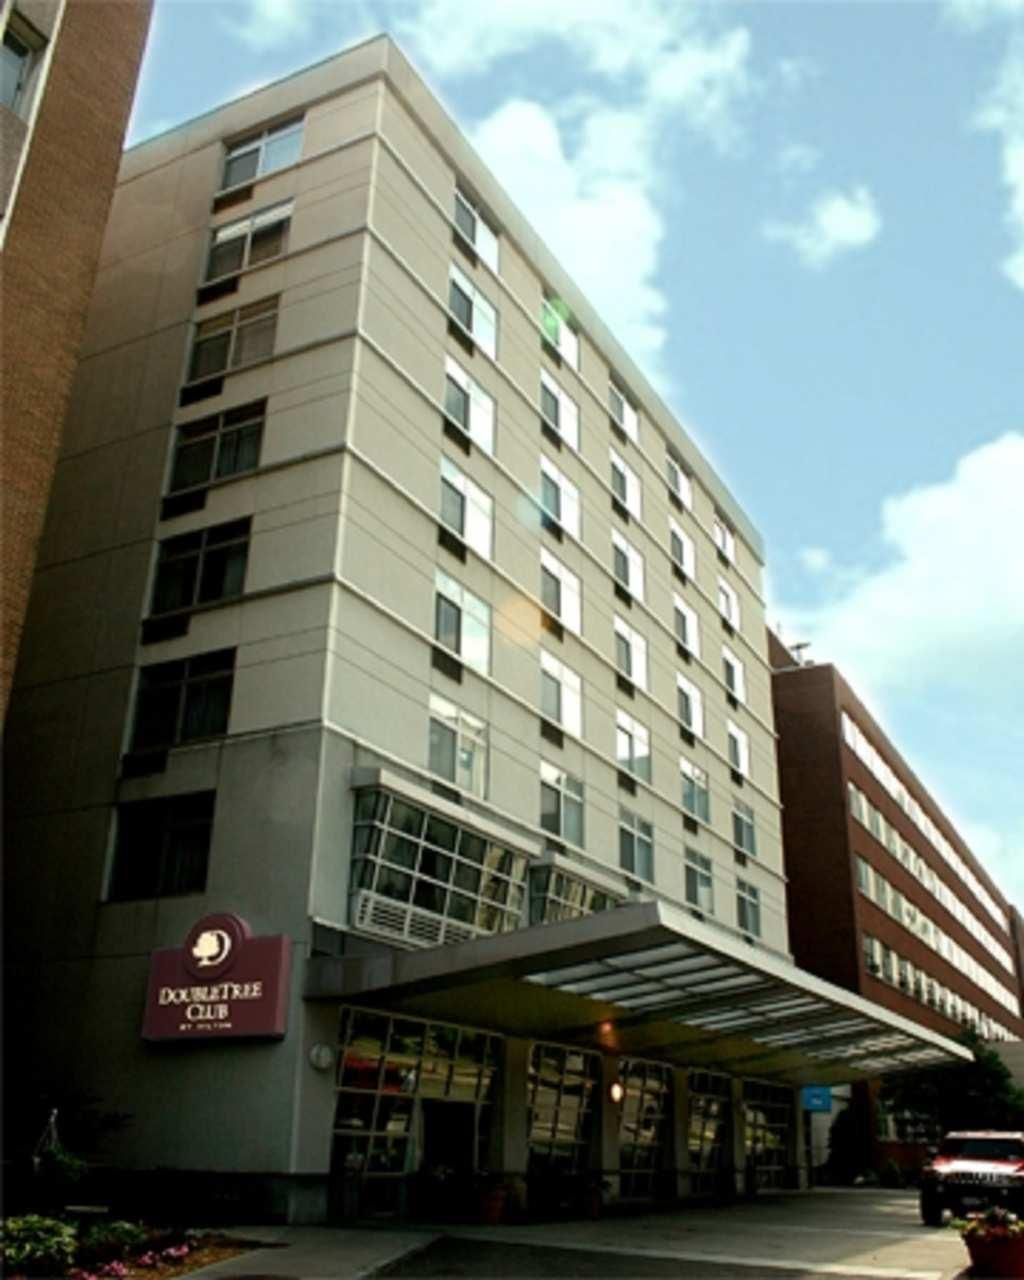 DoubleTree Club by Hilton Hotel Buffalo Downtown image 0